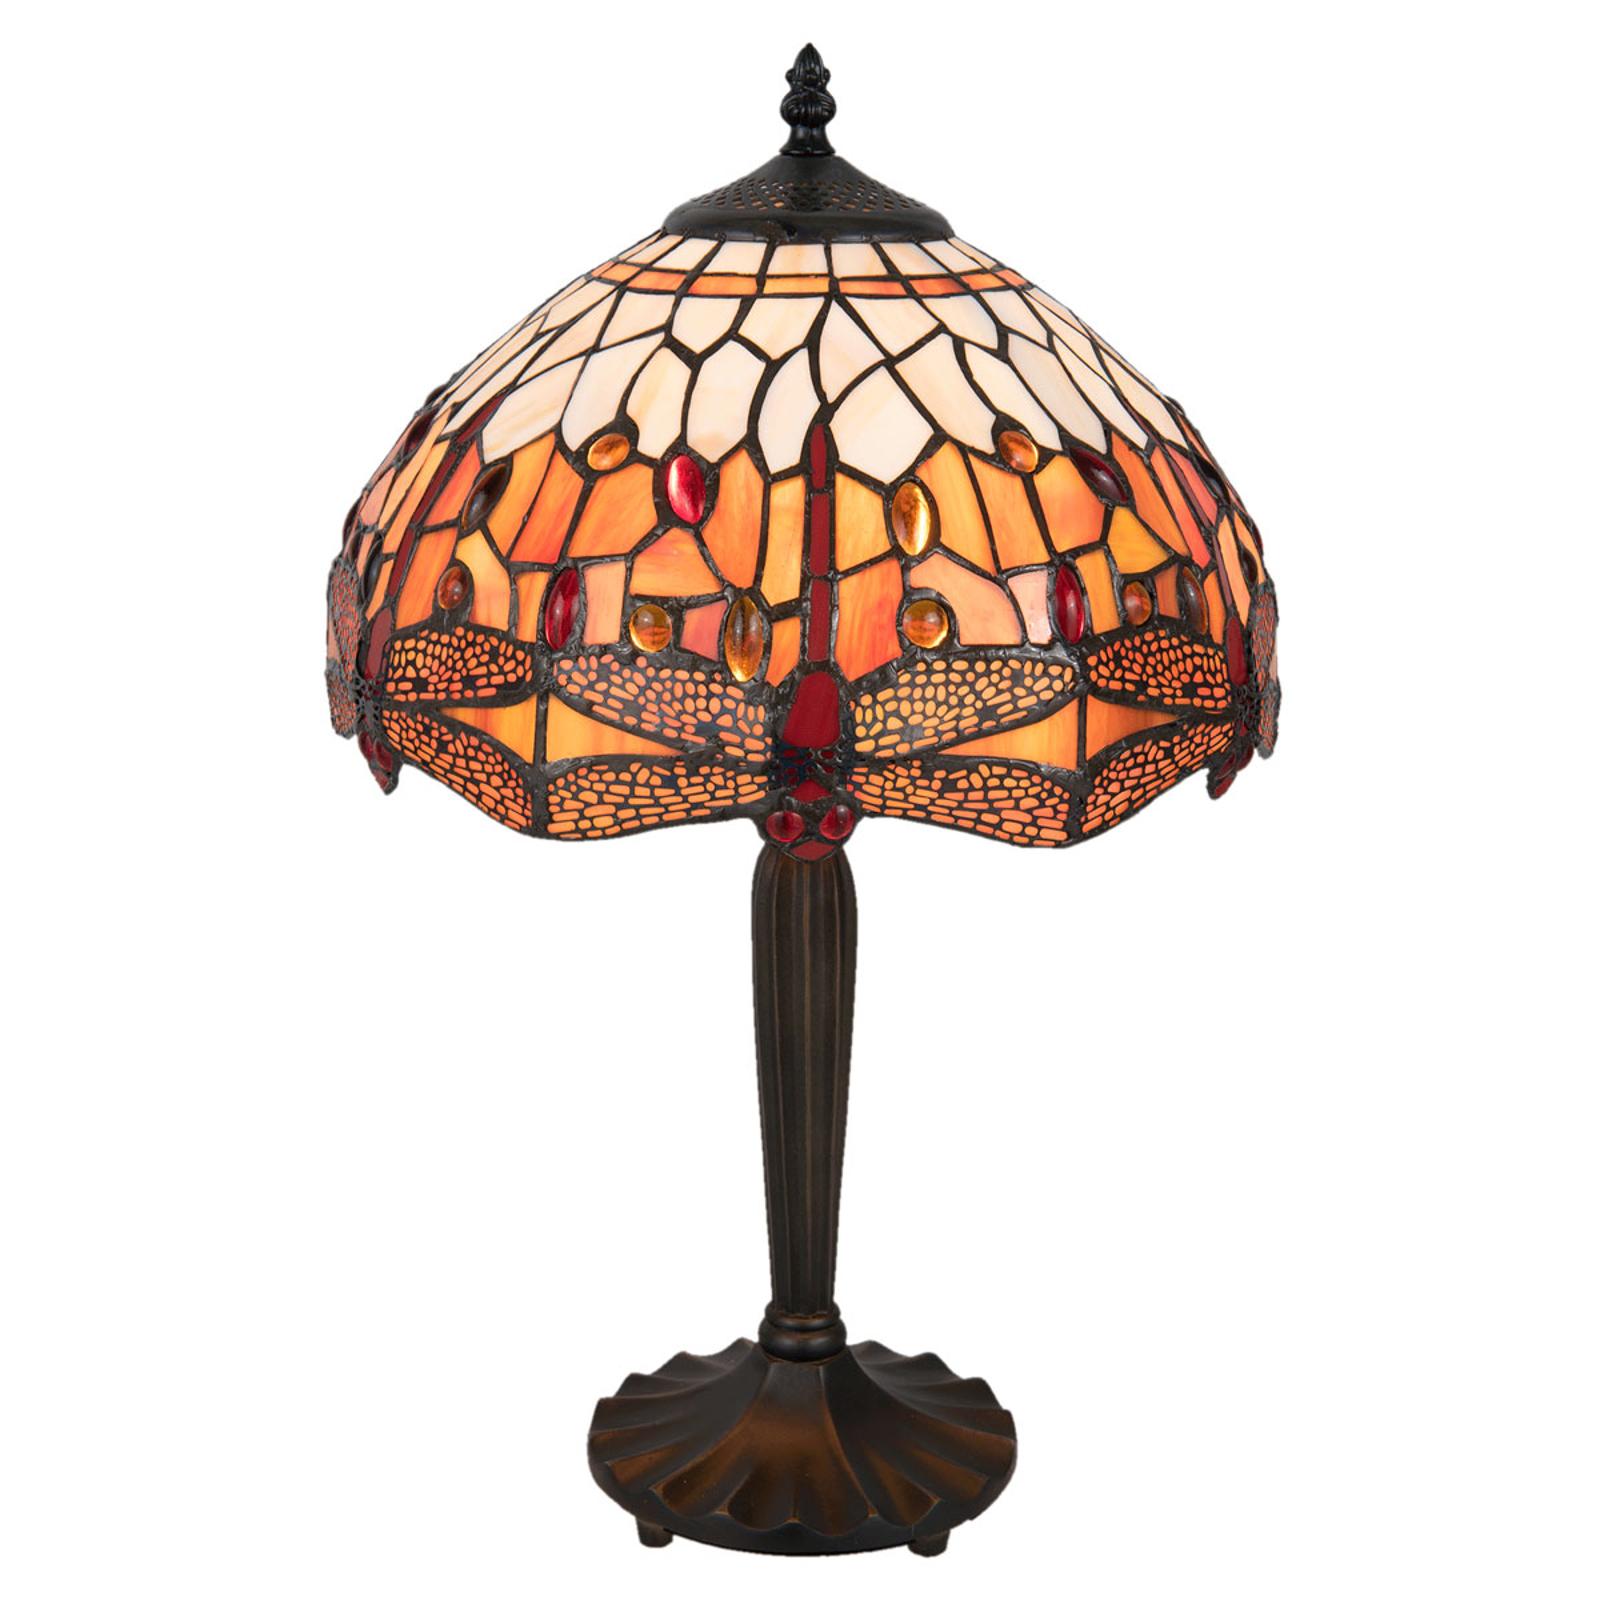 Lampe à poser 5204 motif libellule, rouge-brun